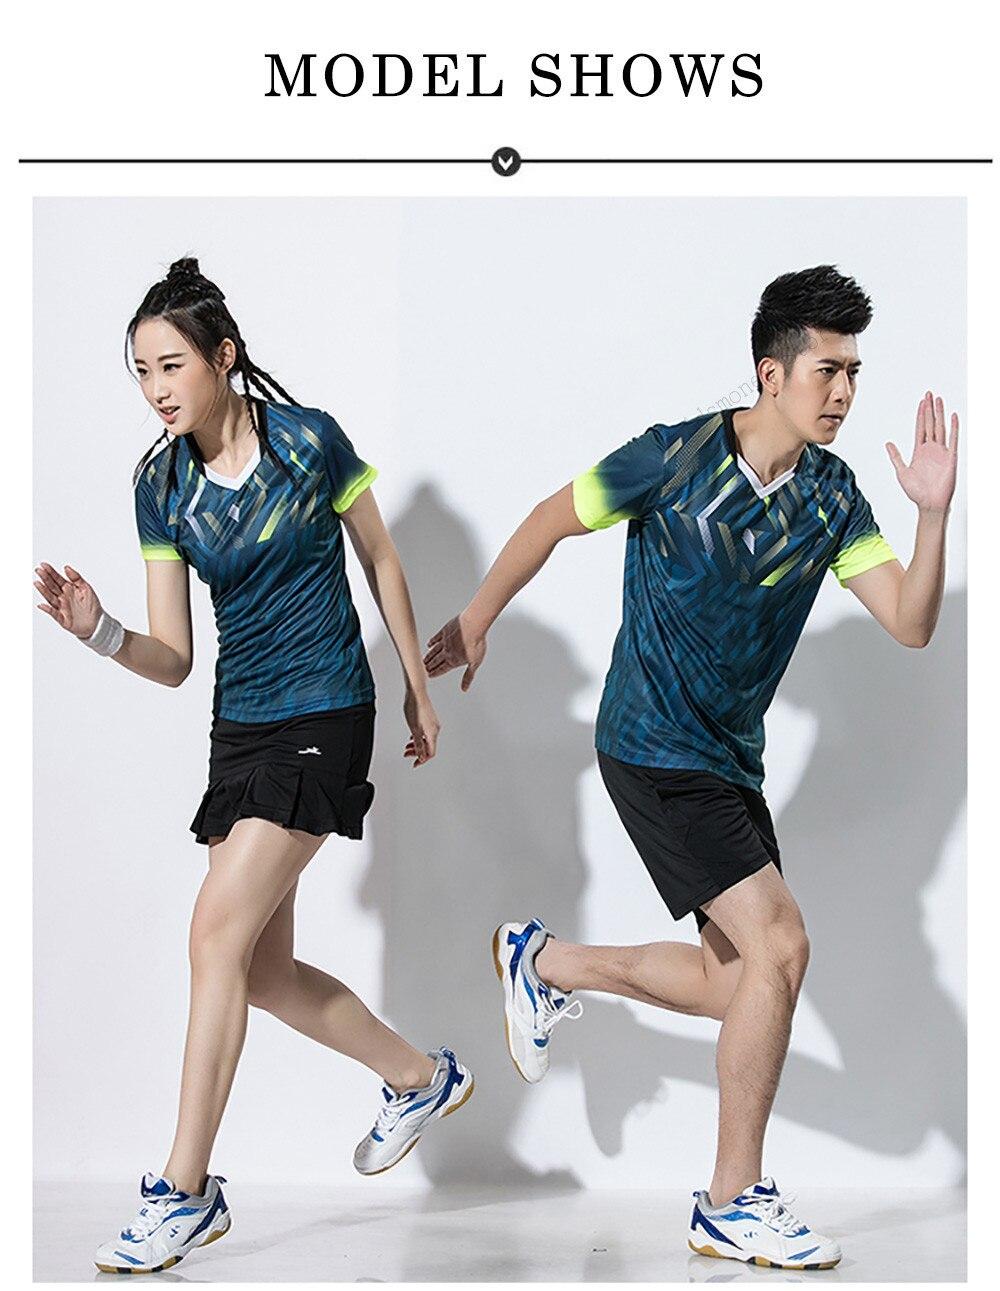 Adsmoney Mulheres Badminton Jersey Terno Homens Camisa